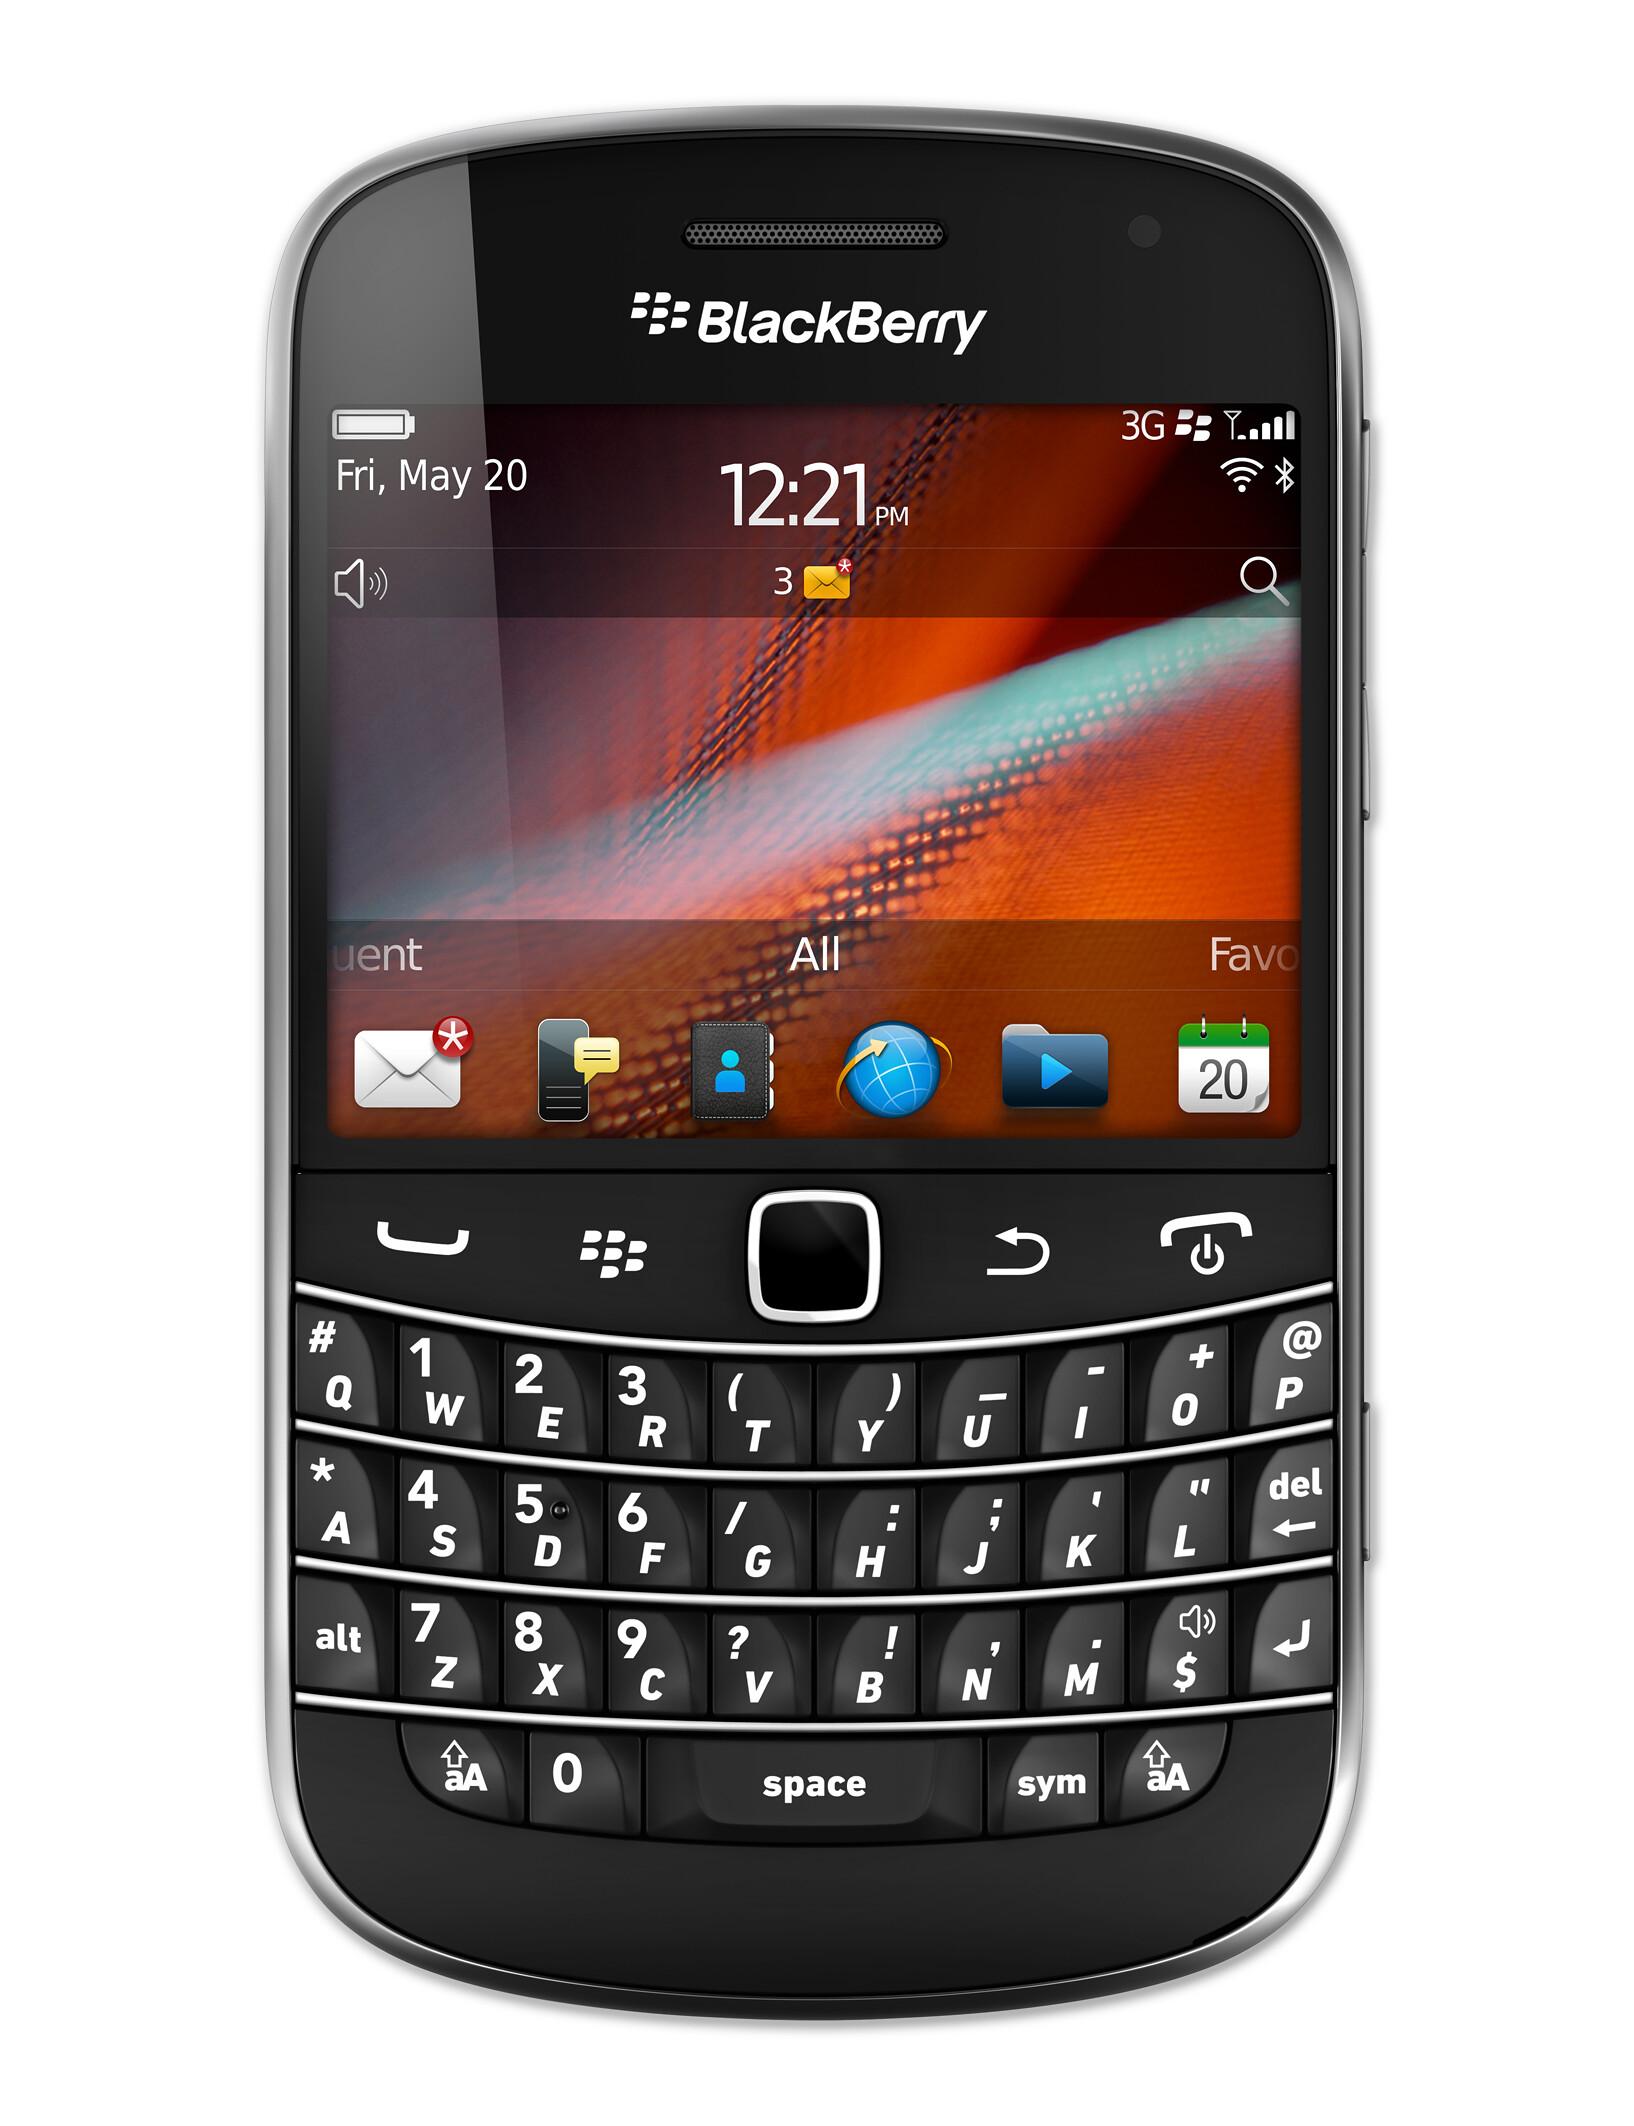 BlackBerry Bold 9930 Specs